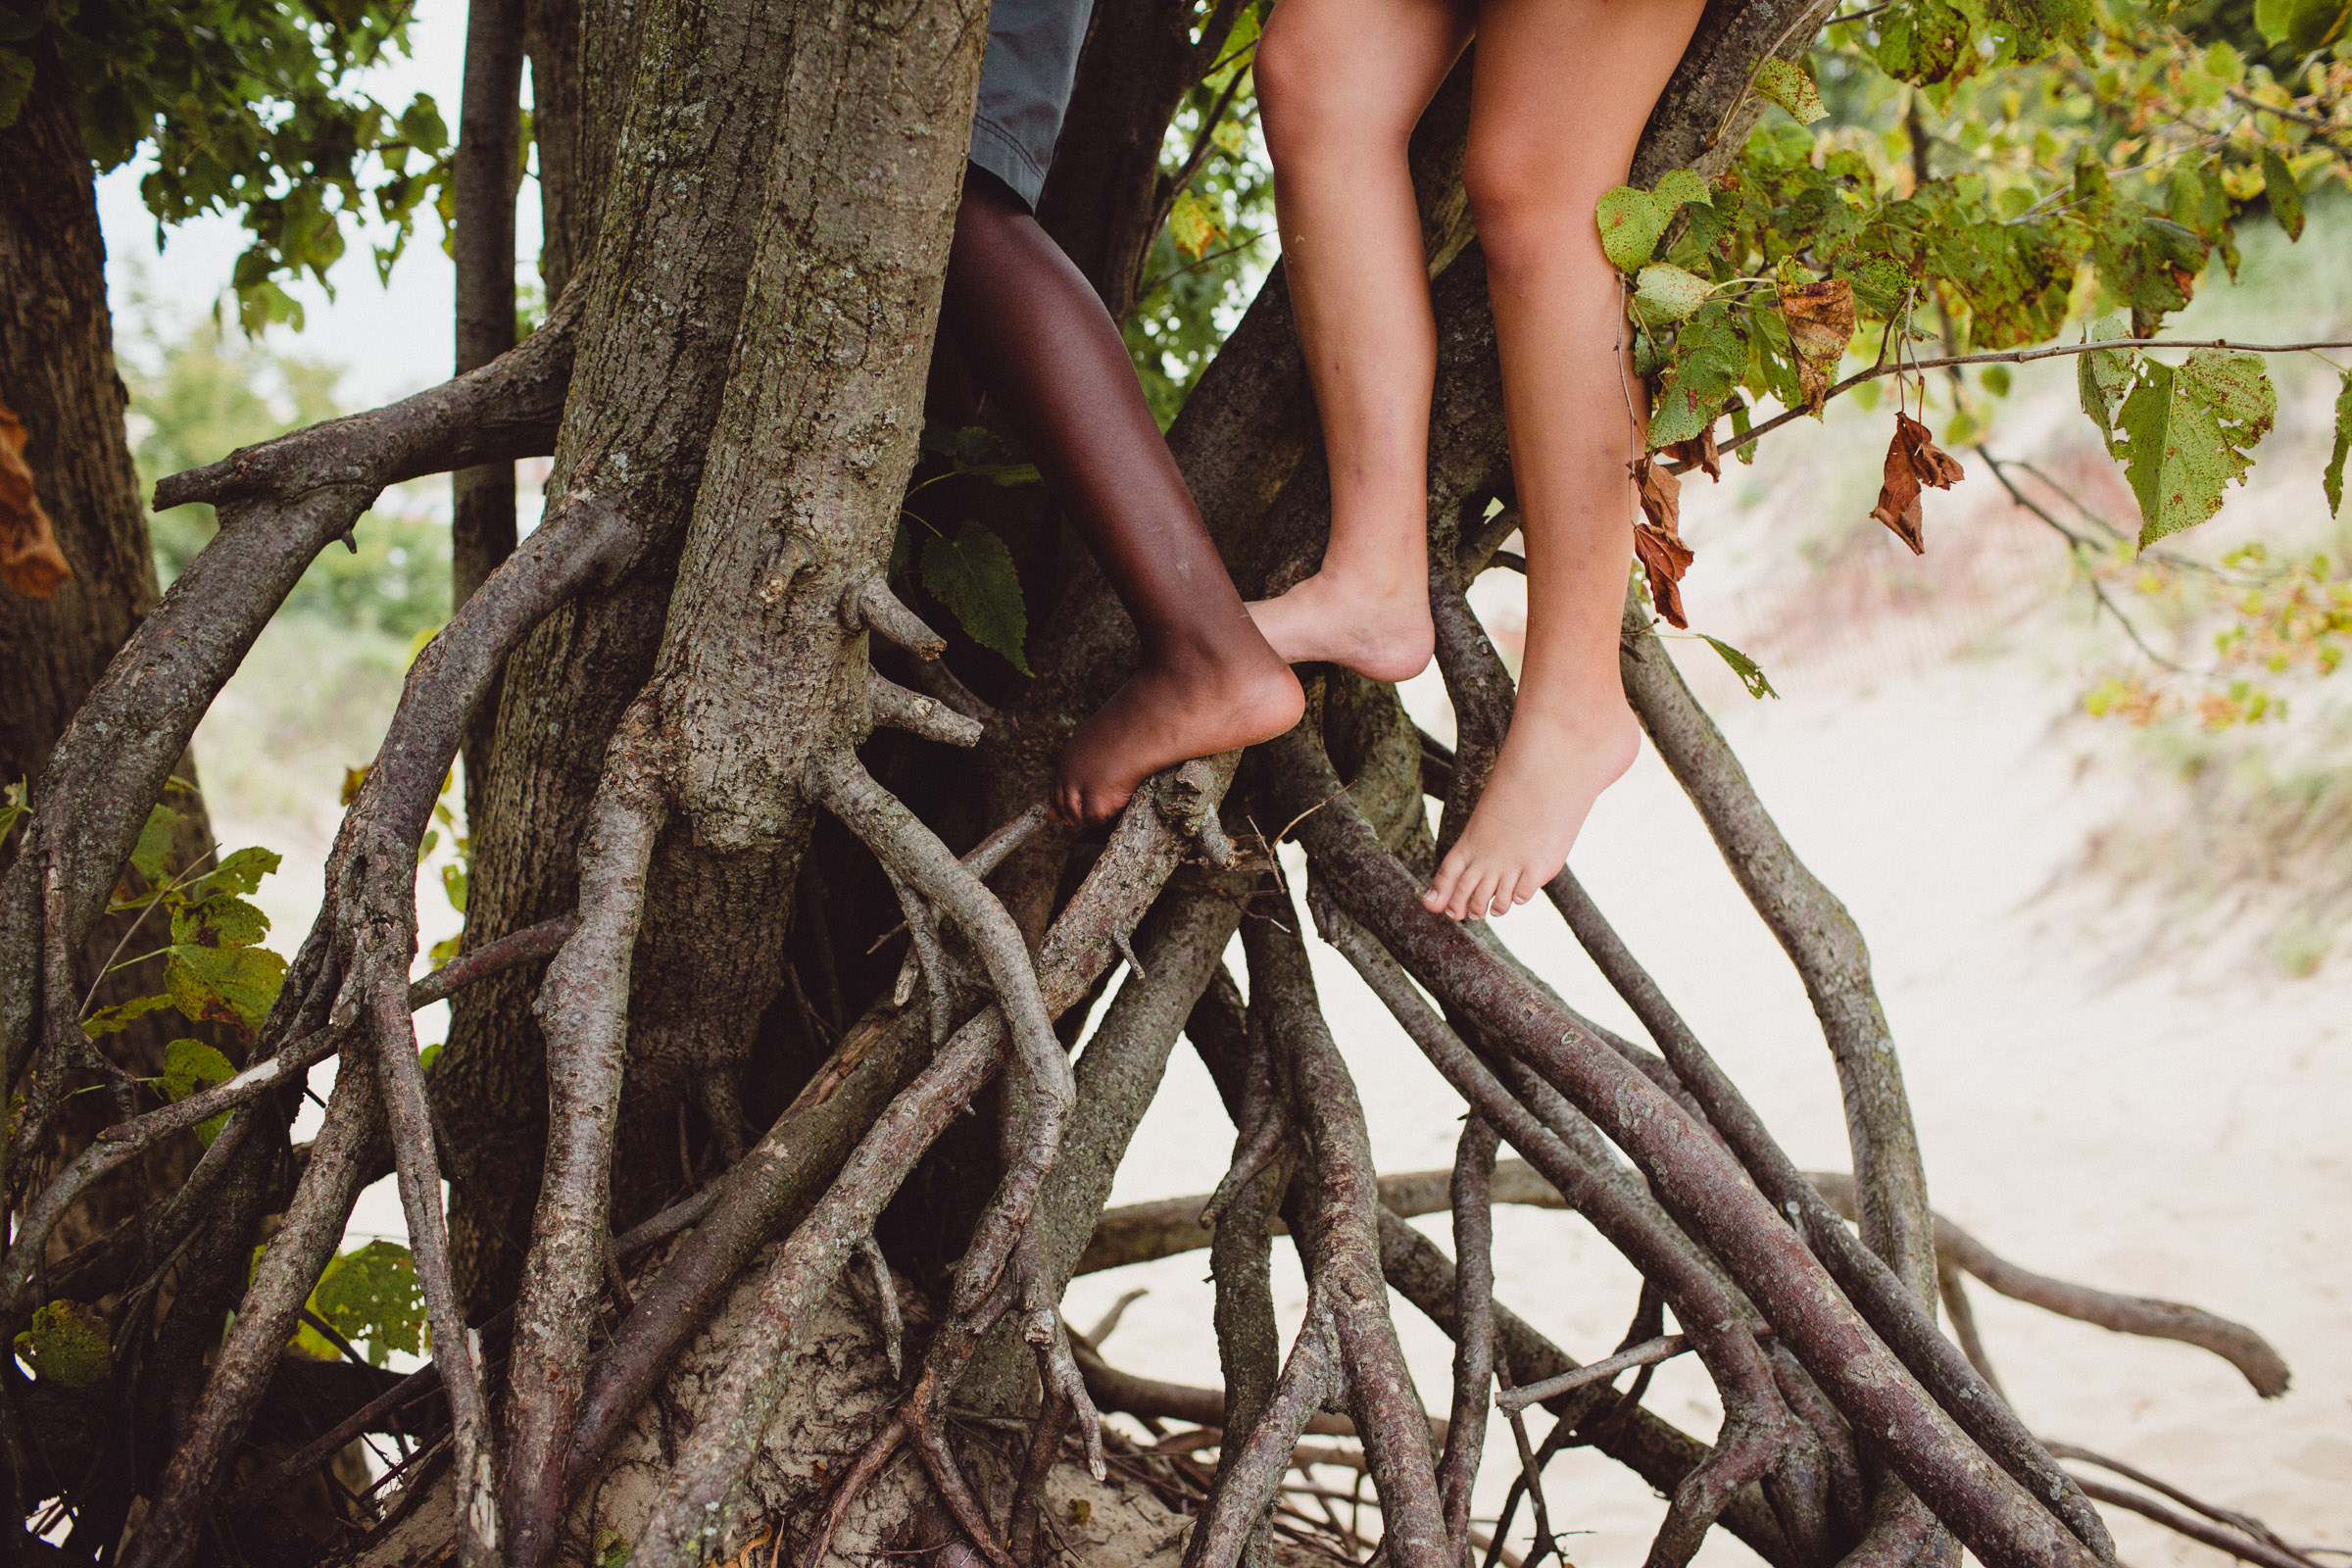 detail image of feet of children climbing trees